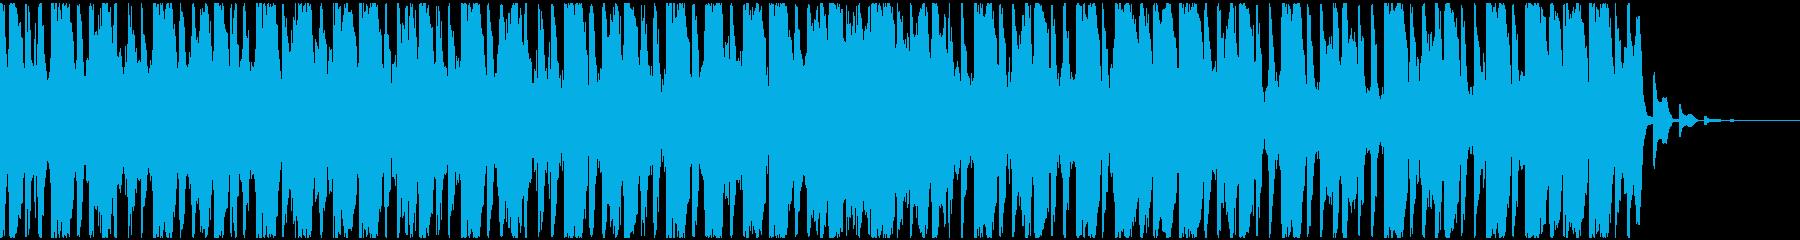 【EDM】トランス、ジングル3の再生済みの波形